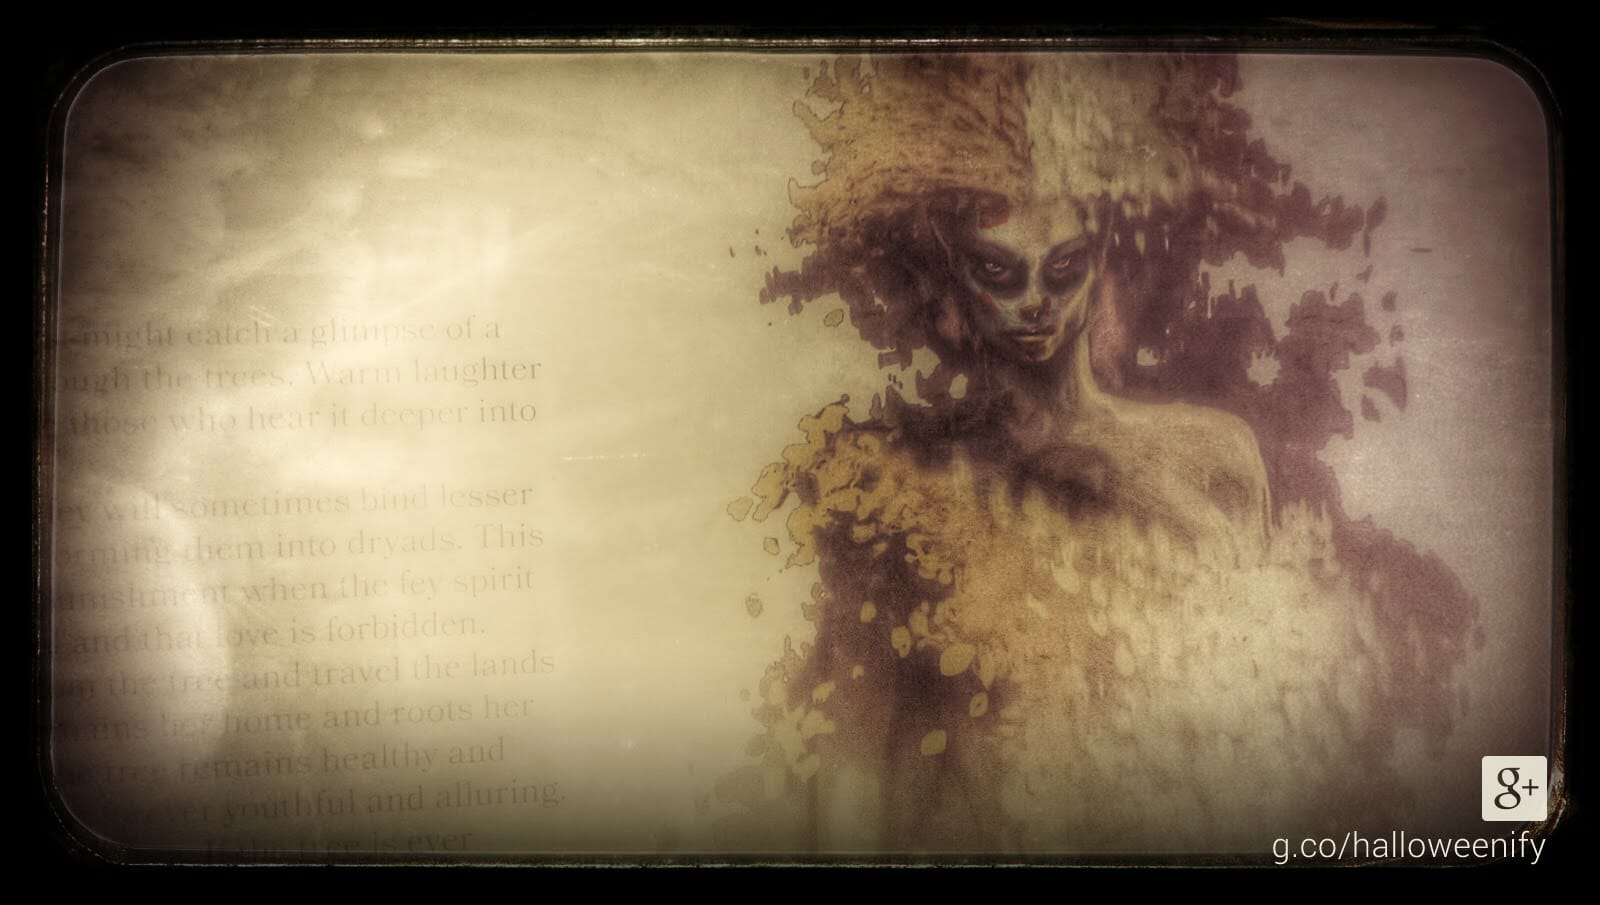 IMAG3312-HALLOWEEN